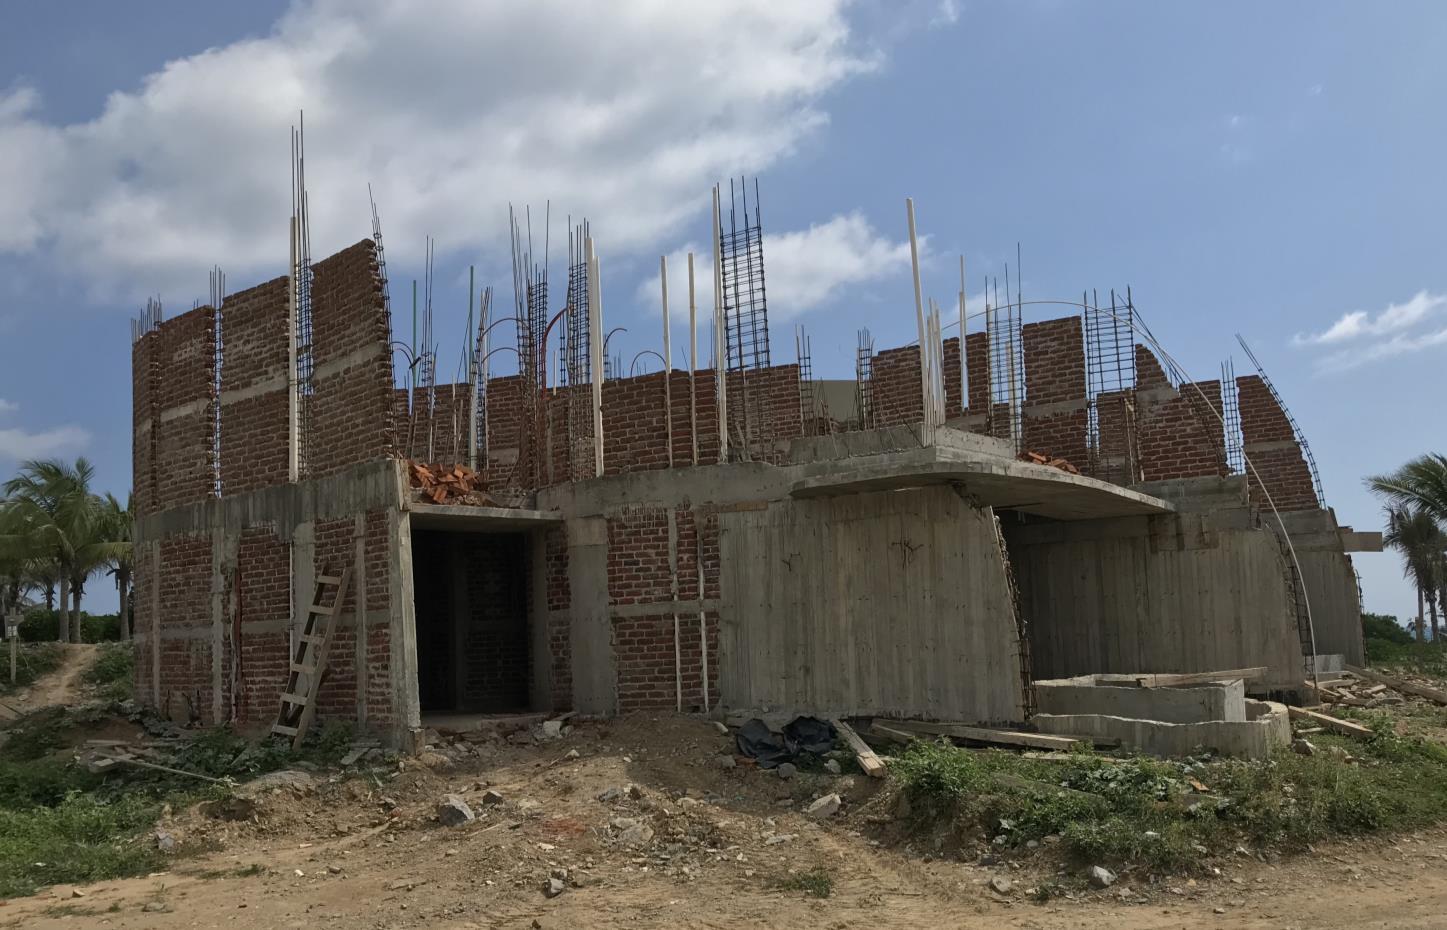 REPORTE-FOTOGRAFICO-PUNTA-MAJAHUA-12-DE-AGOSTO-DEL-2018-022.jpg